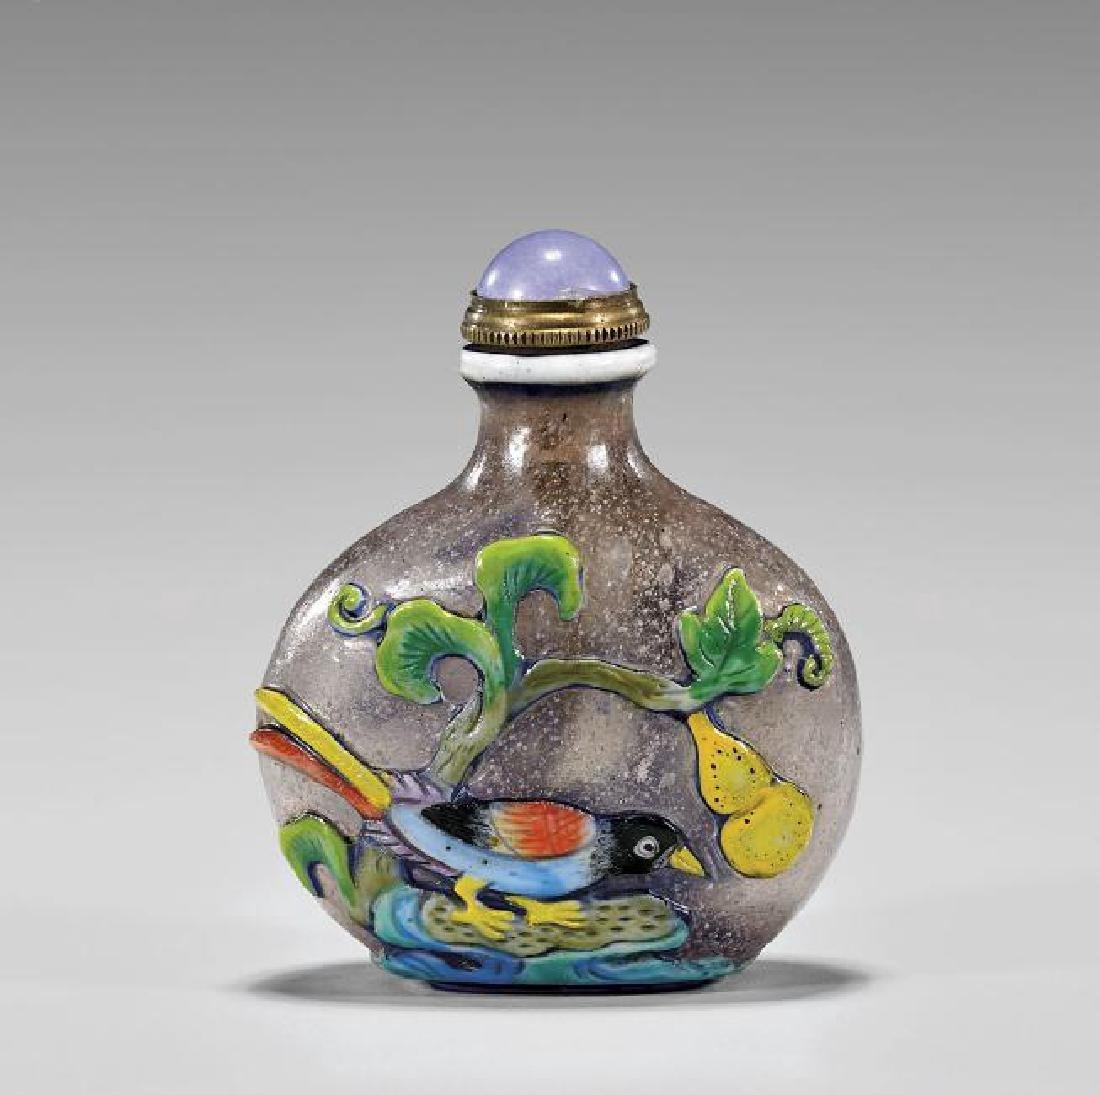 Chinese Enameled Glass Snuff Bottle: Birds & Flowers